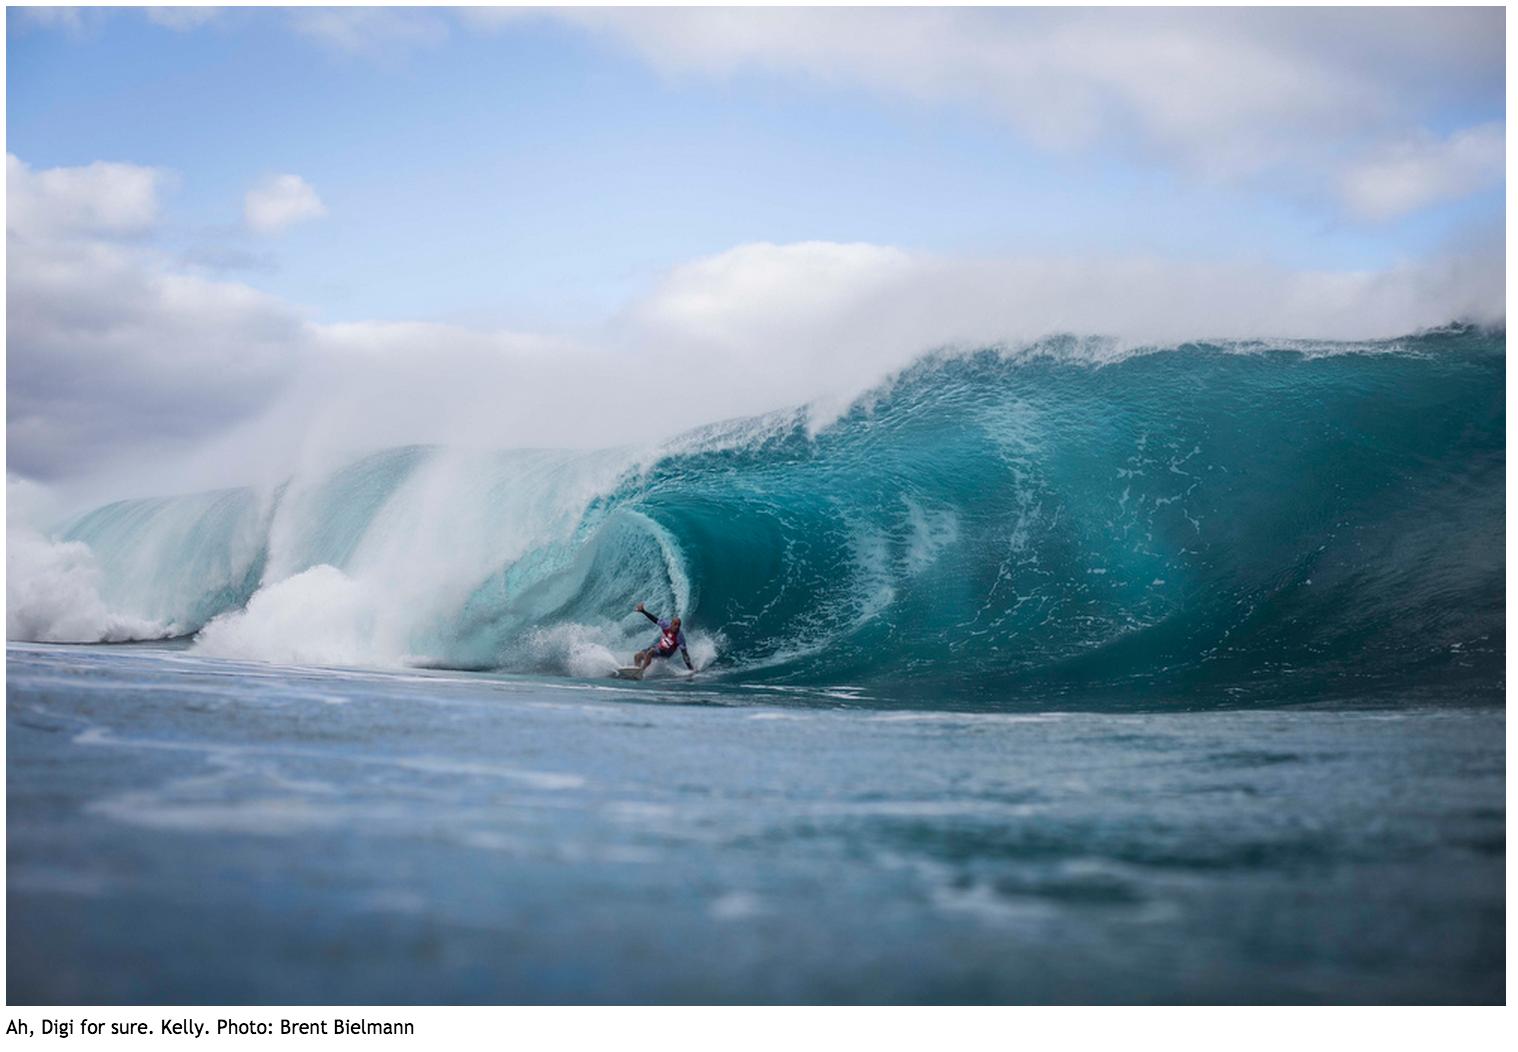 From SurfingMagazine.com